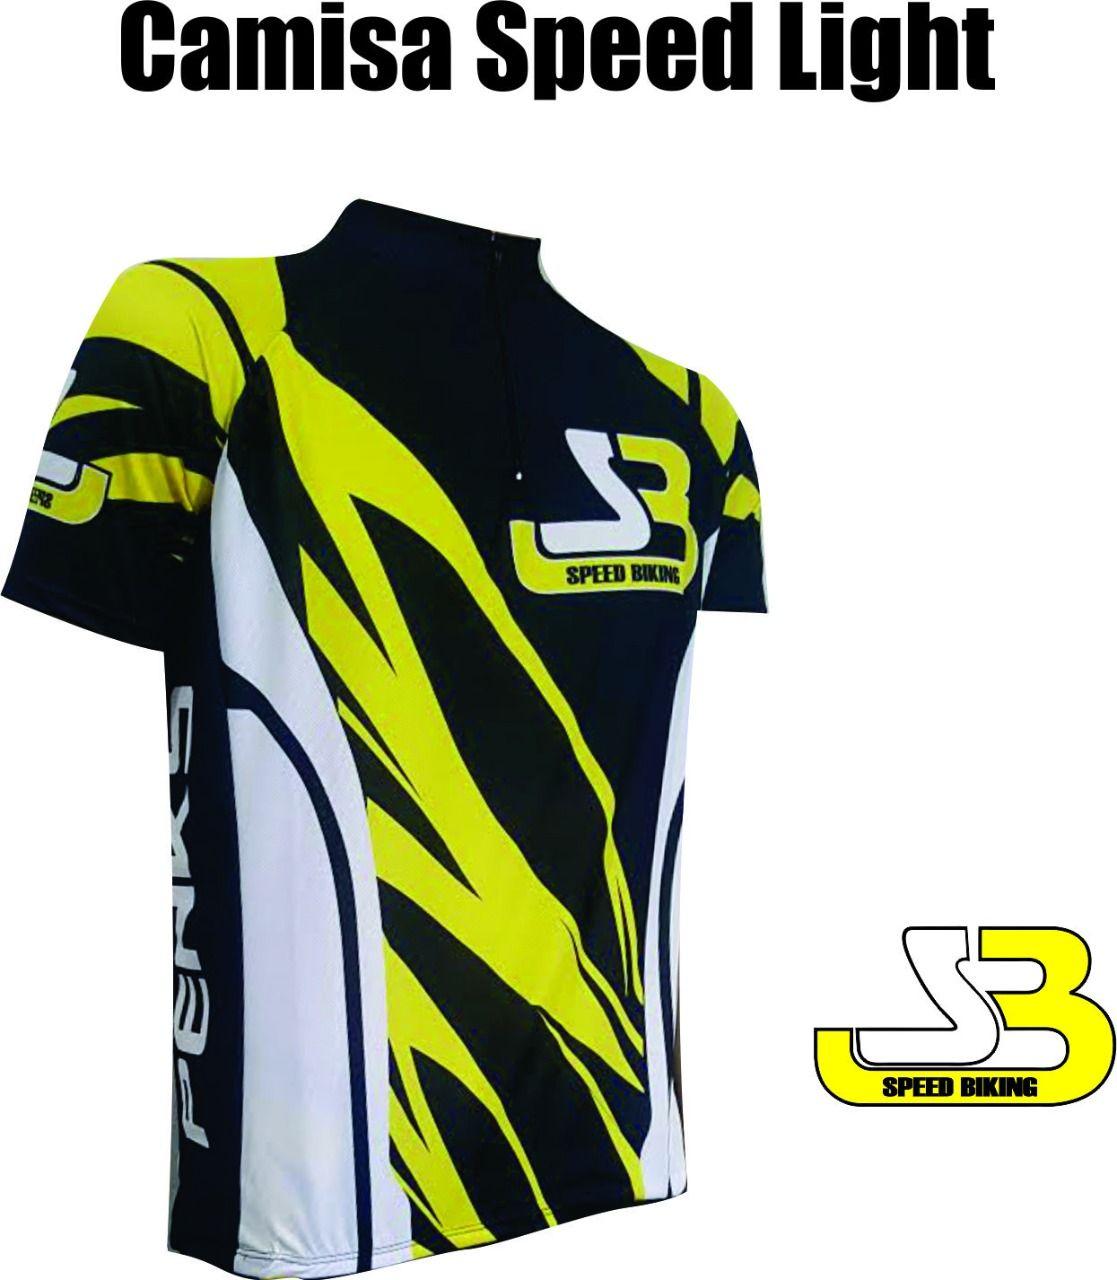 Camisa Speed Light